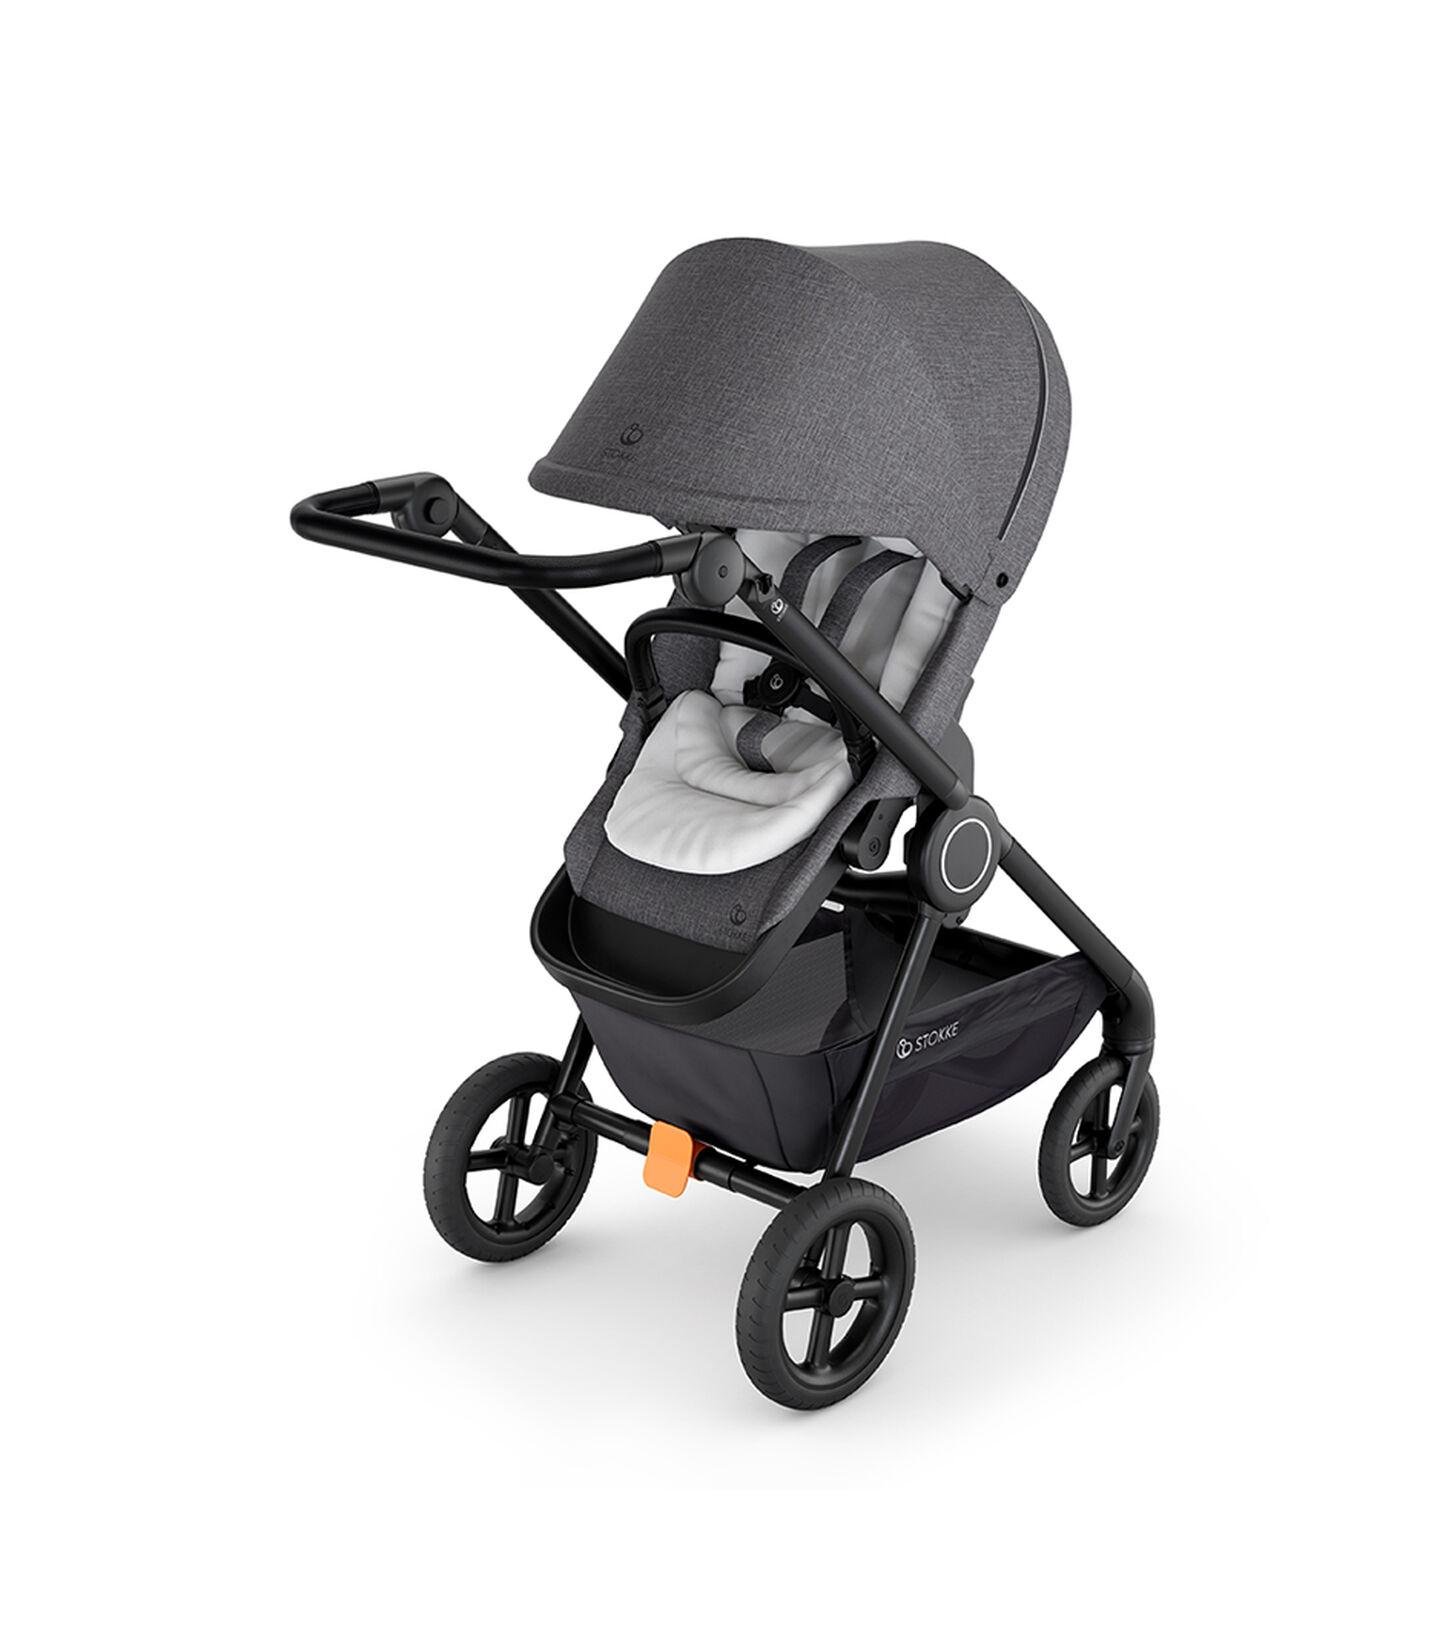 Stokke® Stroller Infant Insert, , mainview view 2